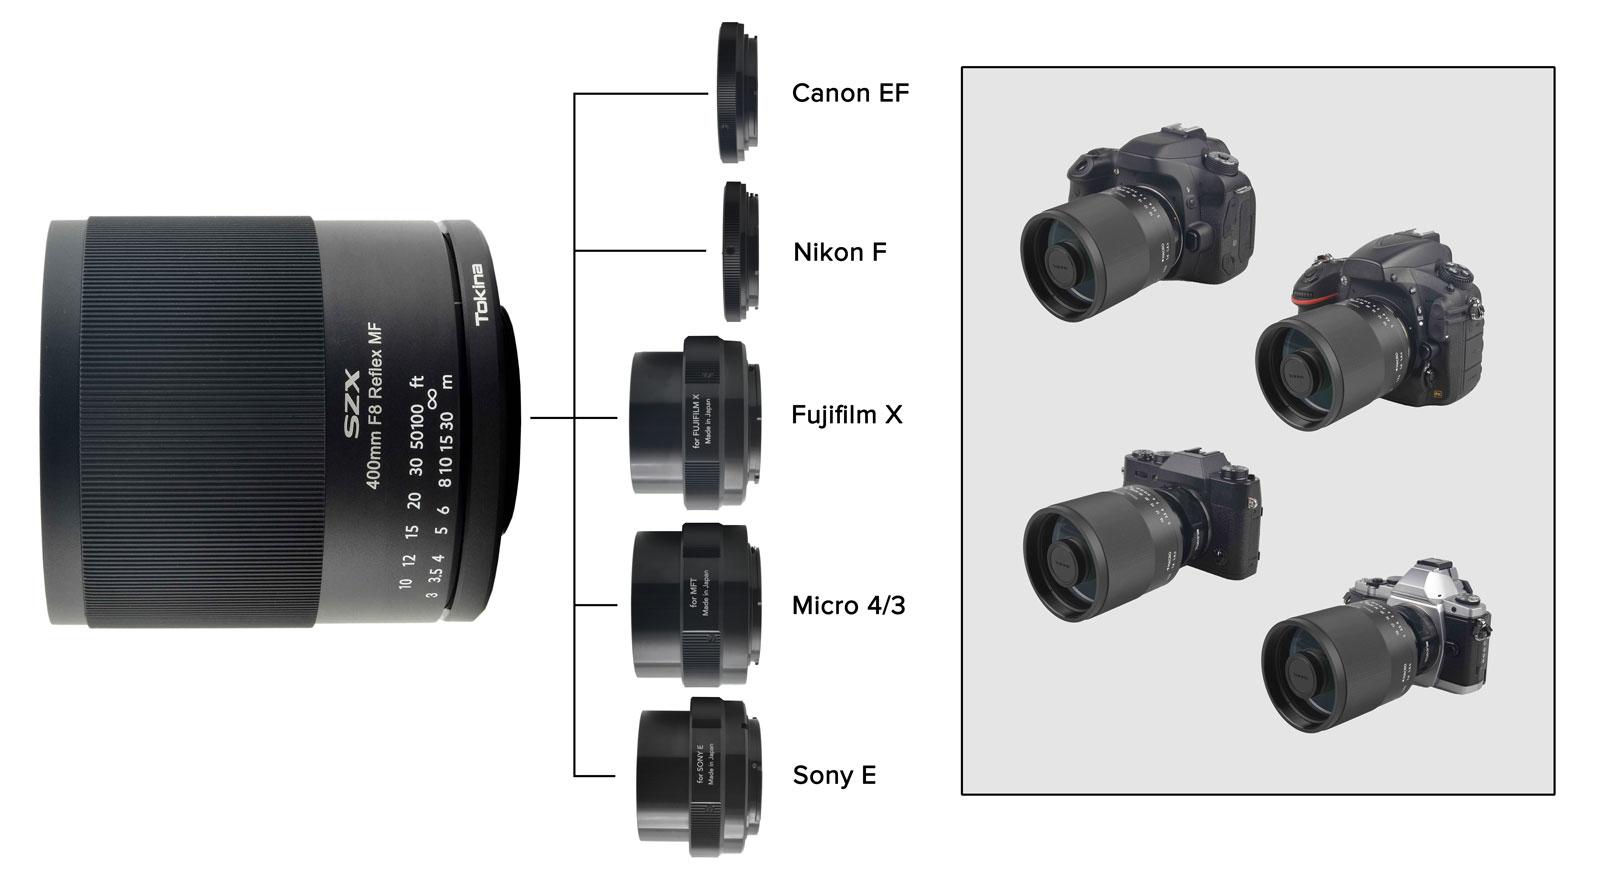 Tokina-SZX-SUPER-TELE-400mm-F8-Reflex-MF-Spiegelobjektiv-Teleobjektiv-MFT